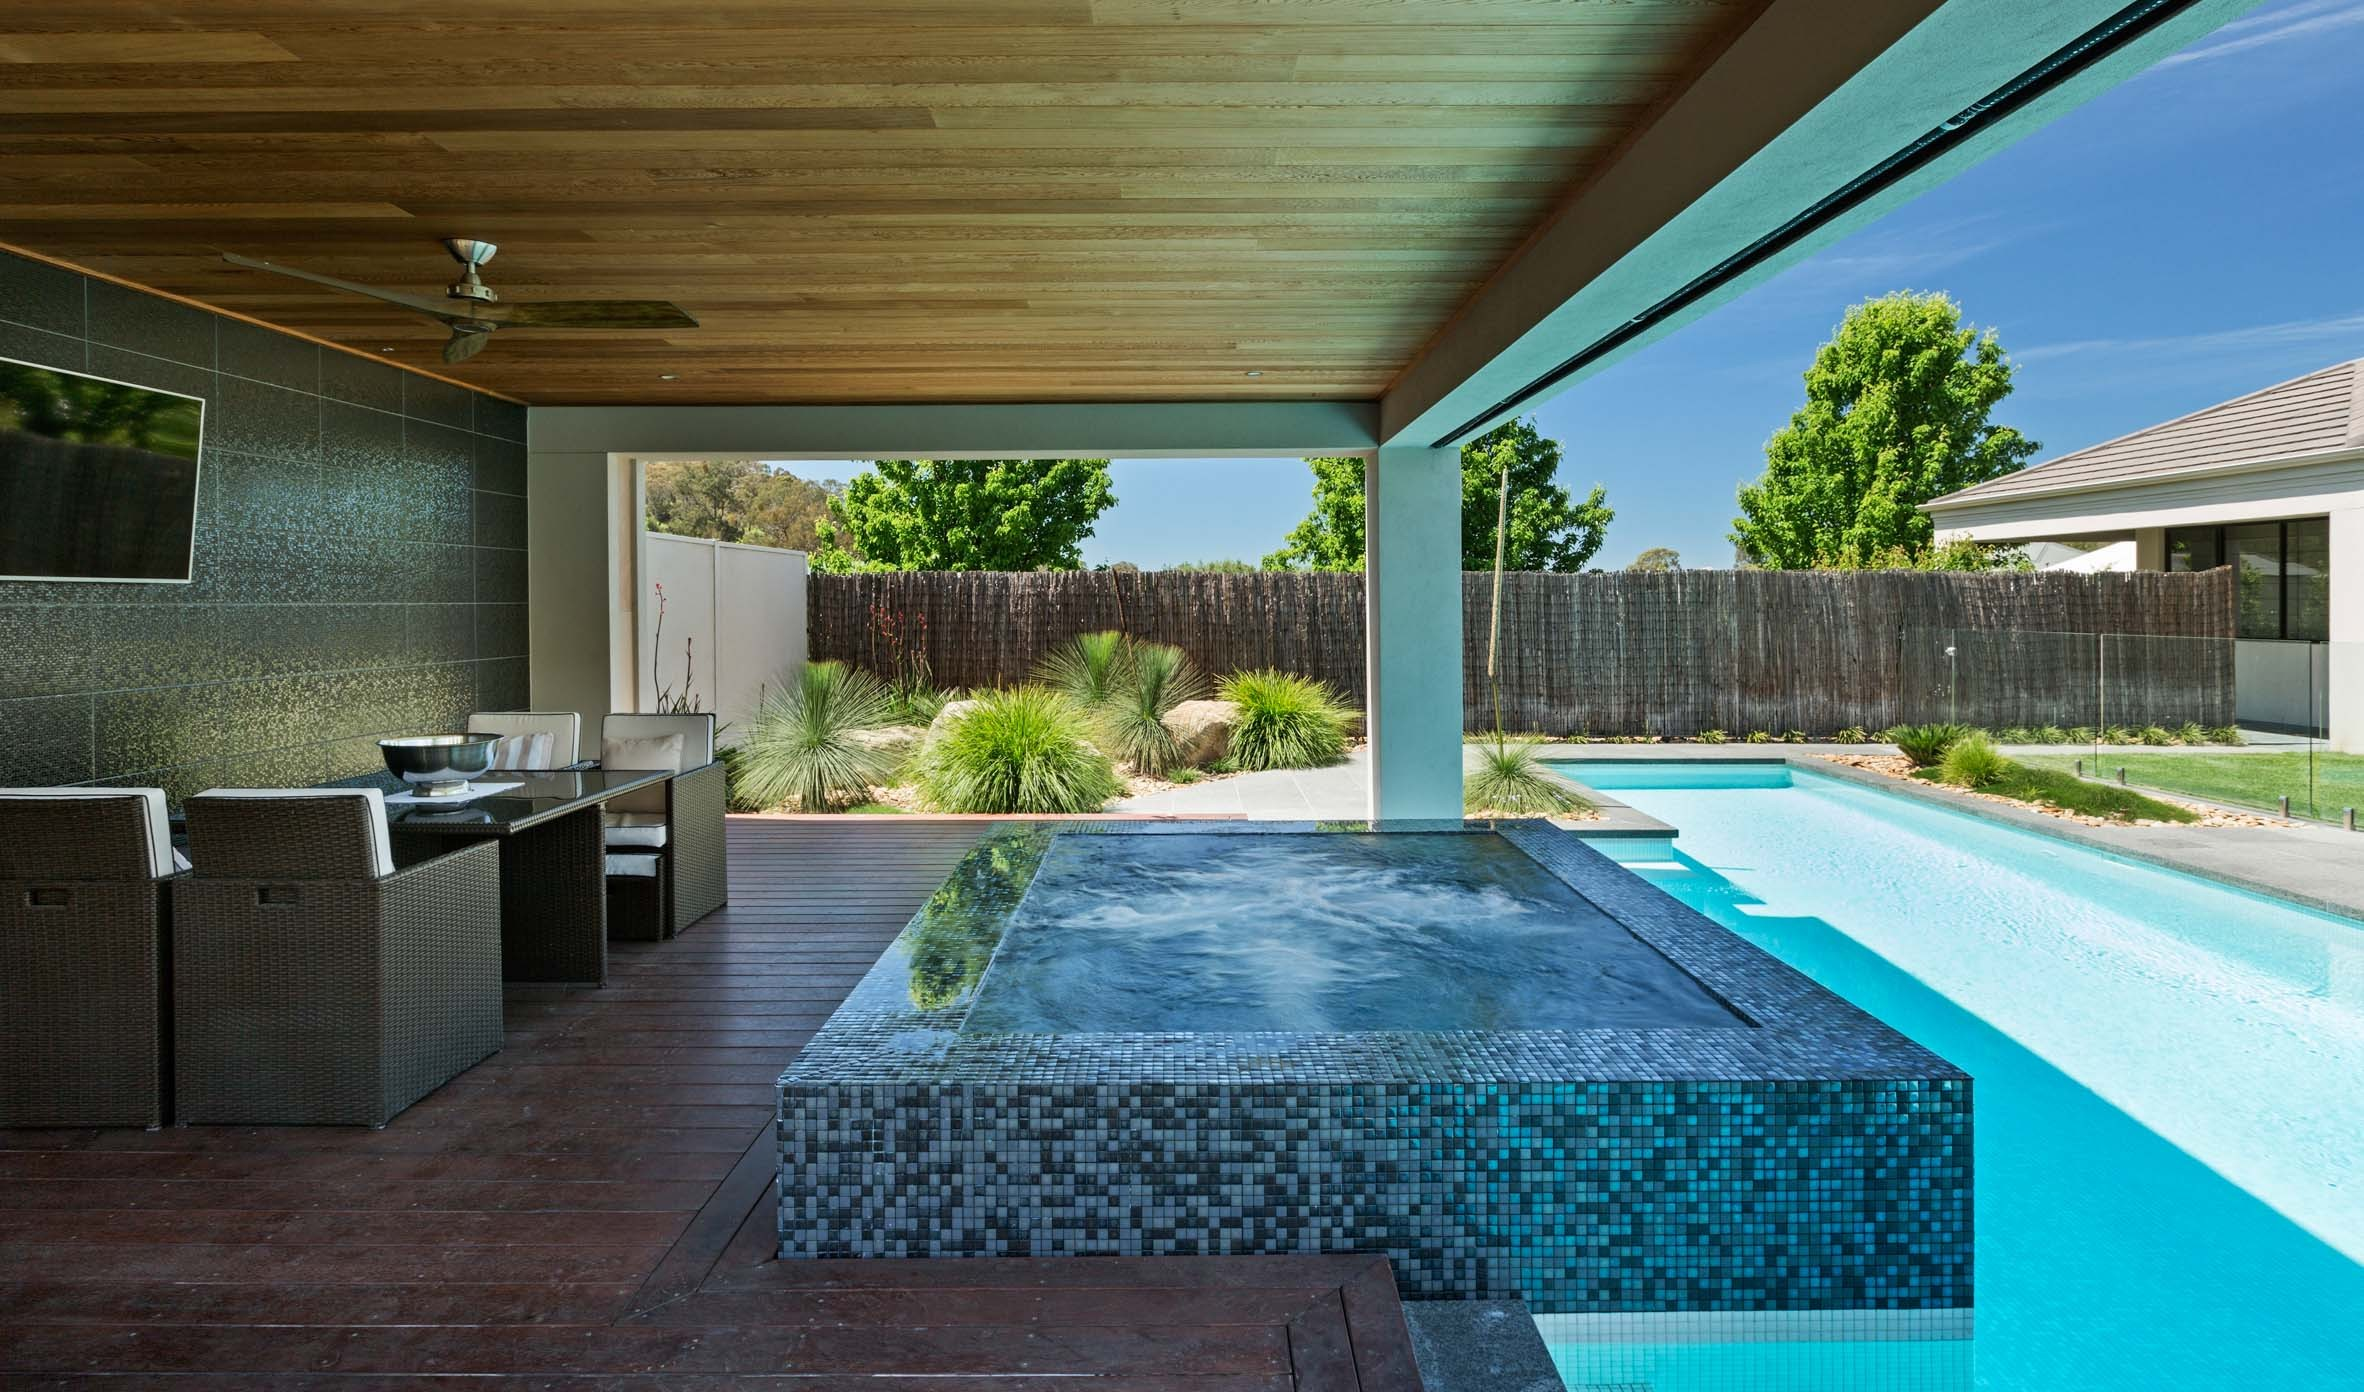 Pool-Tiles Thumbnails pool-tiles-28